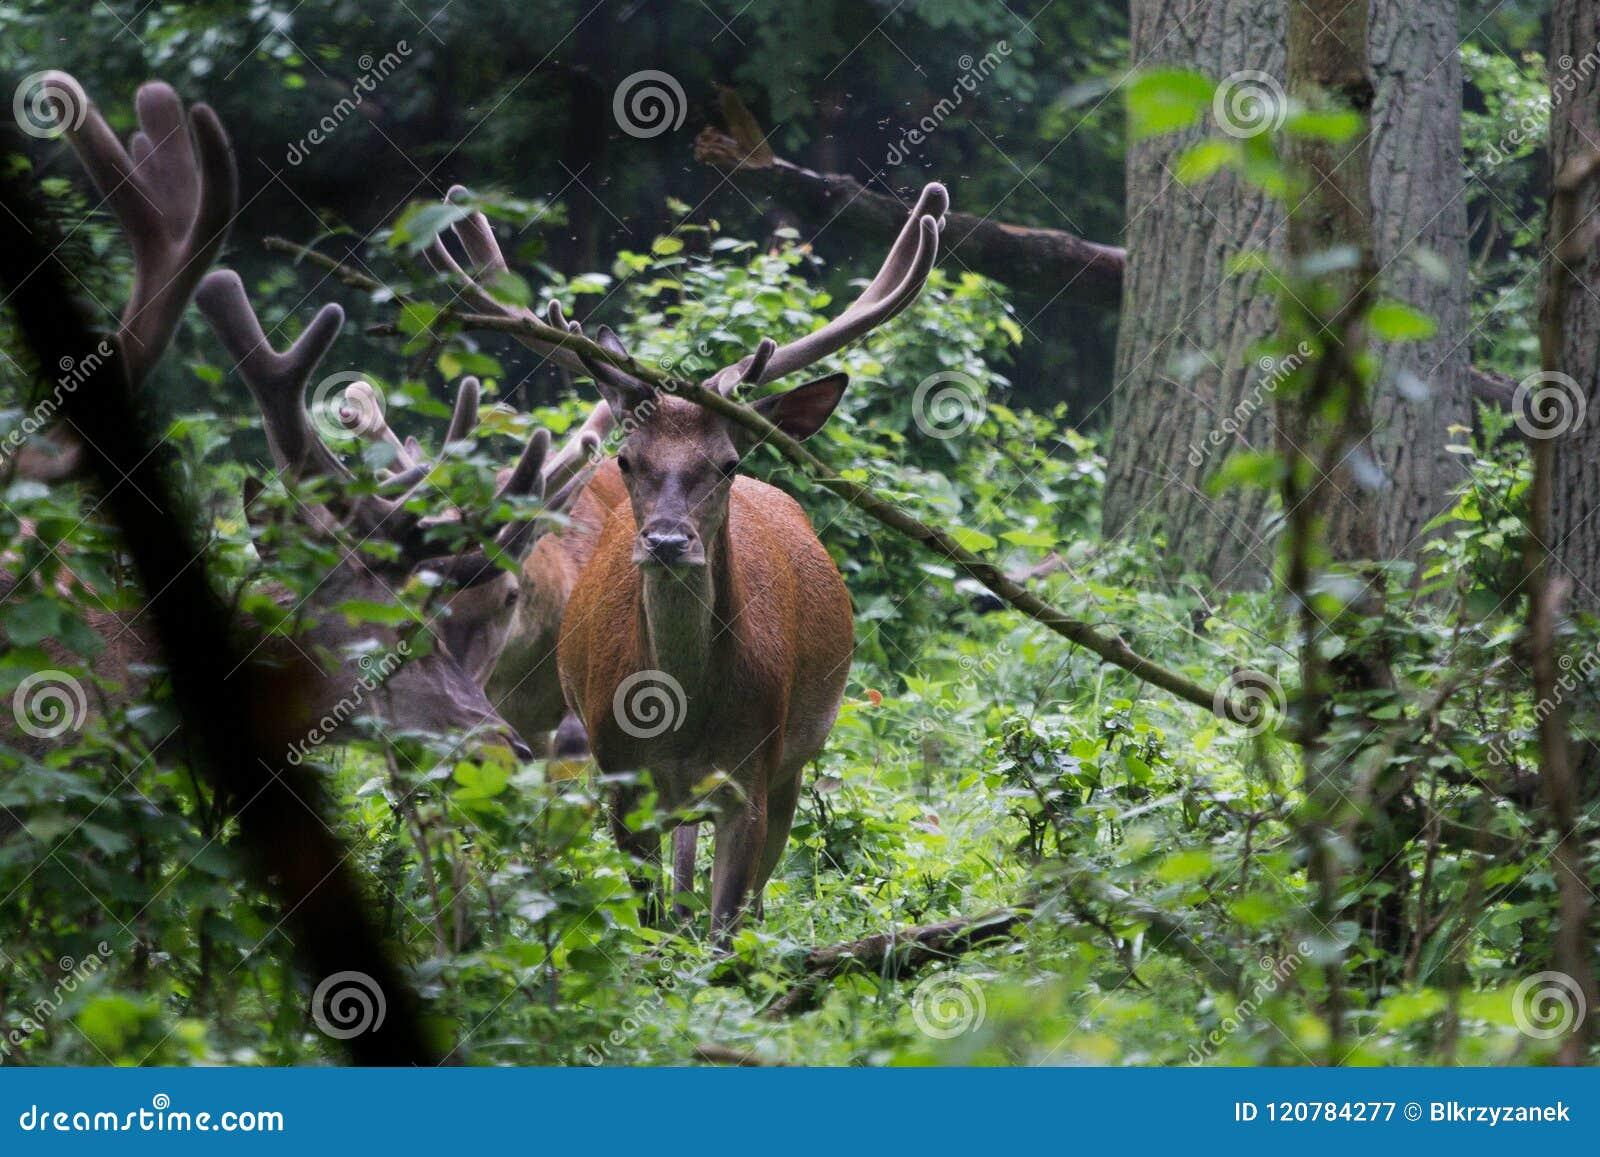 Red deer with antlers. Velvet covers a growing antler.